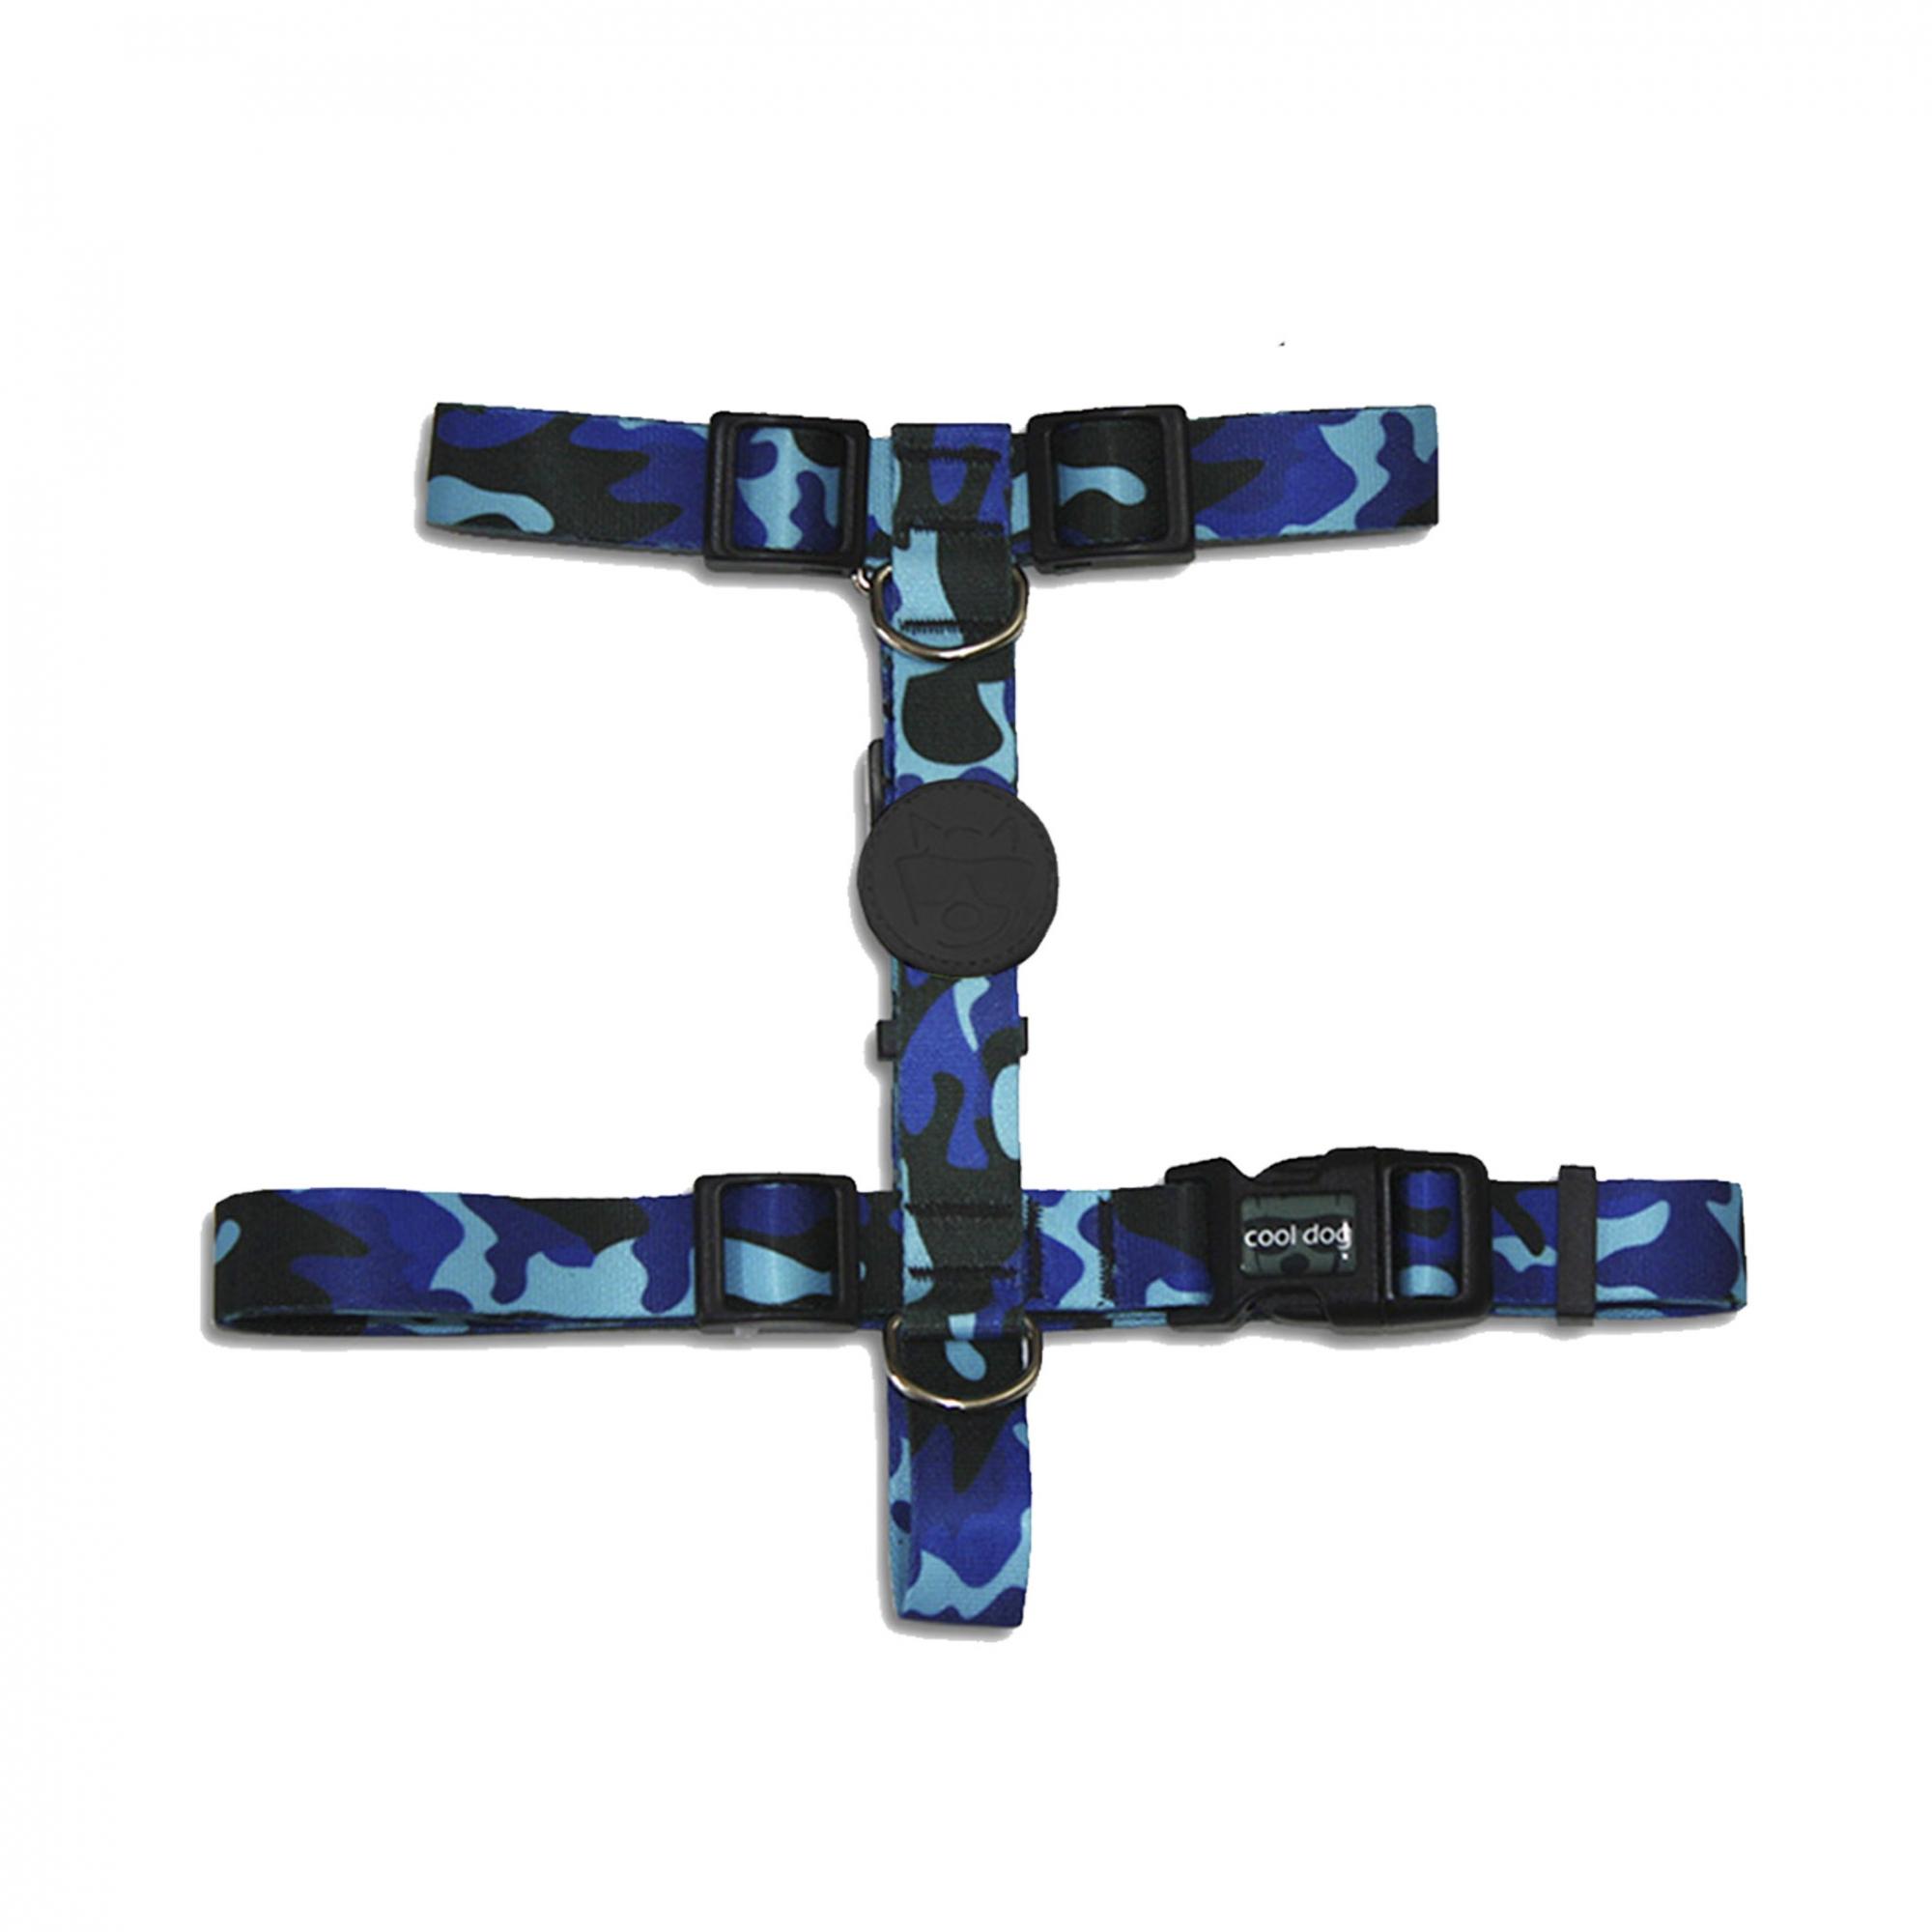 Kit Blue Army - Peitoral e Guia - CoolDog